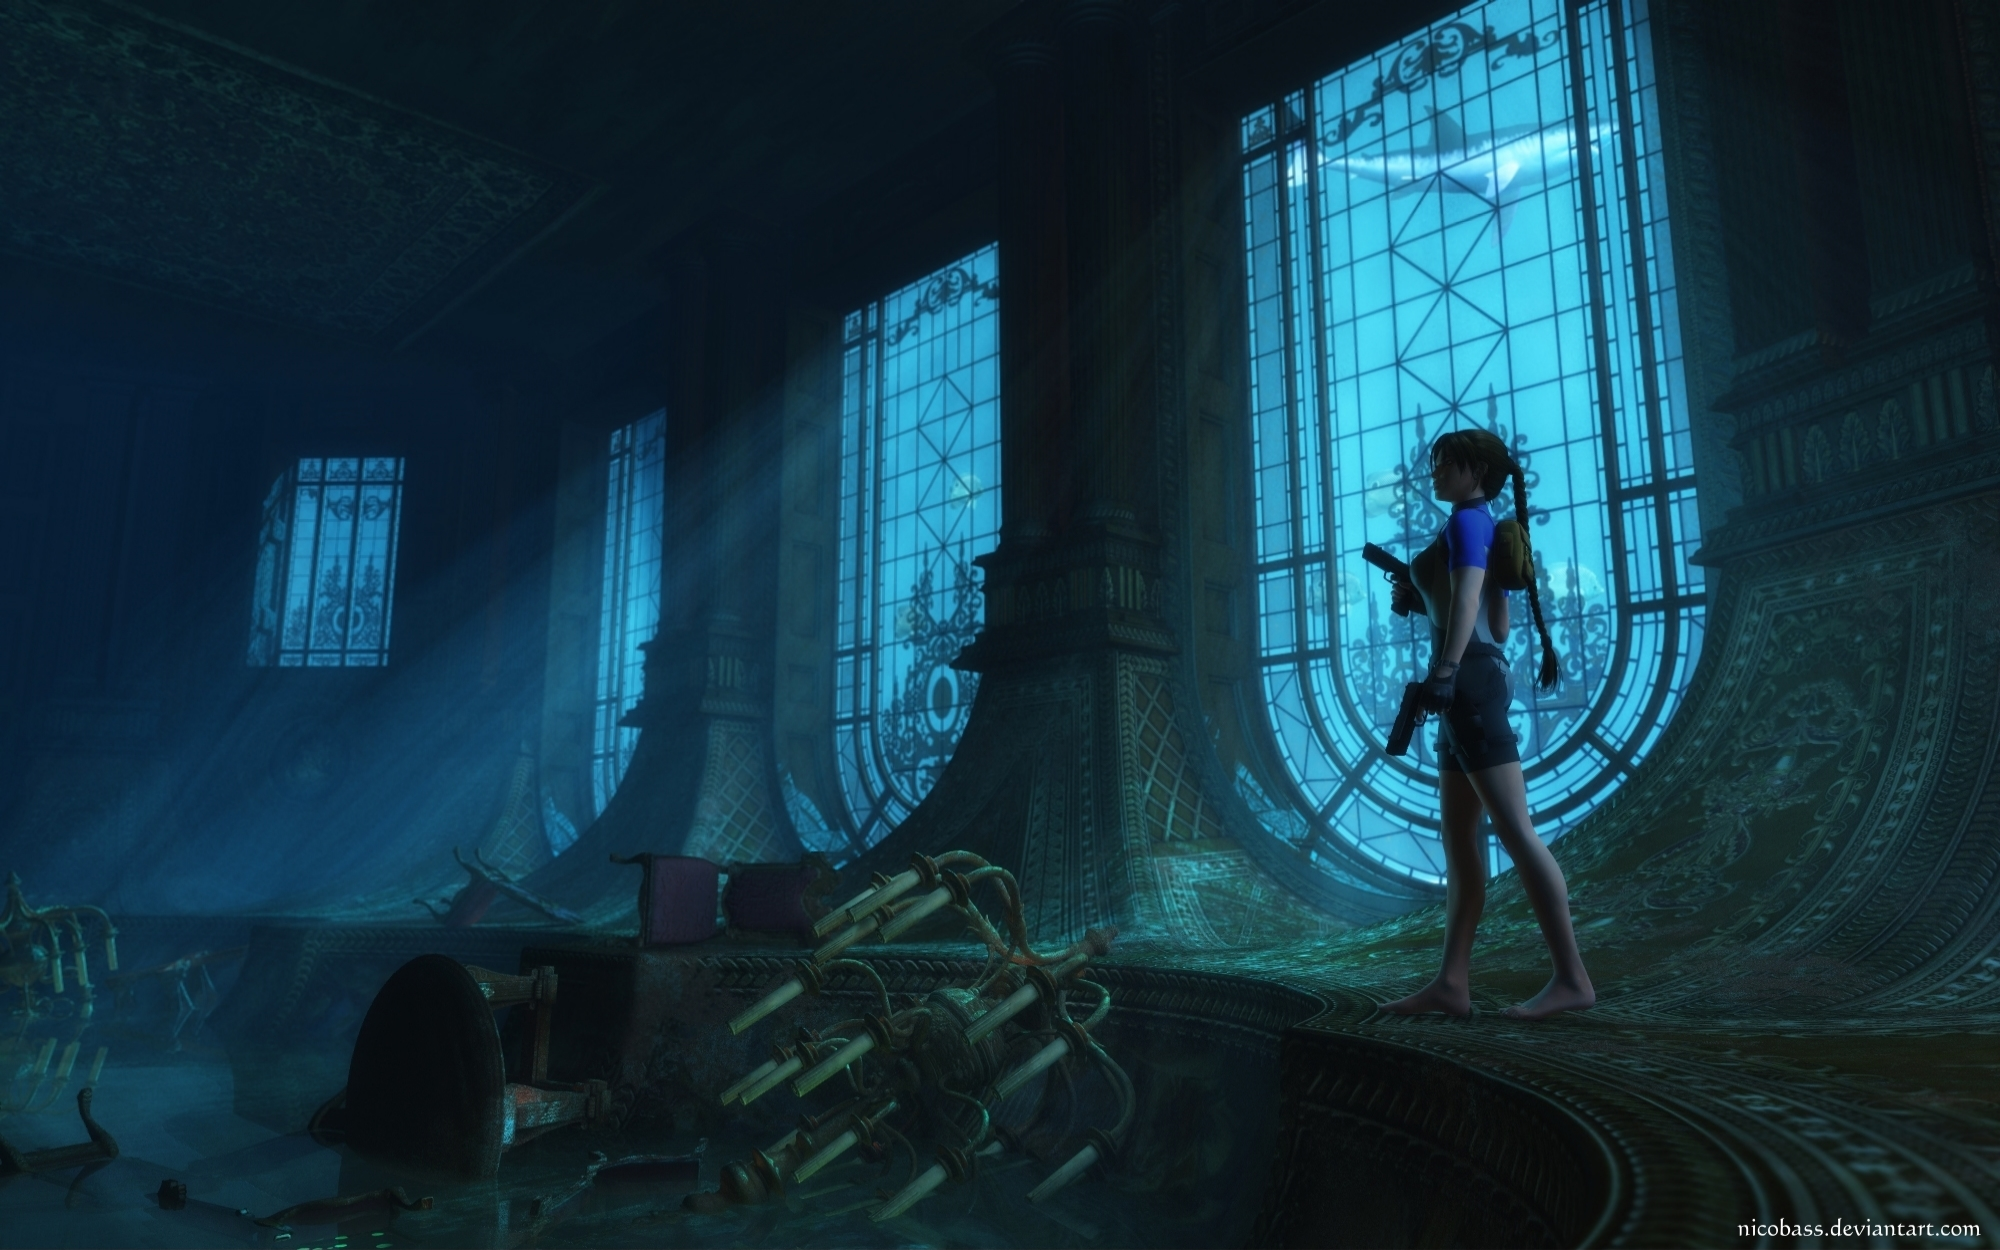 Lara Croft 89 by Nicobass